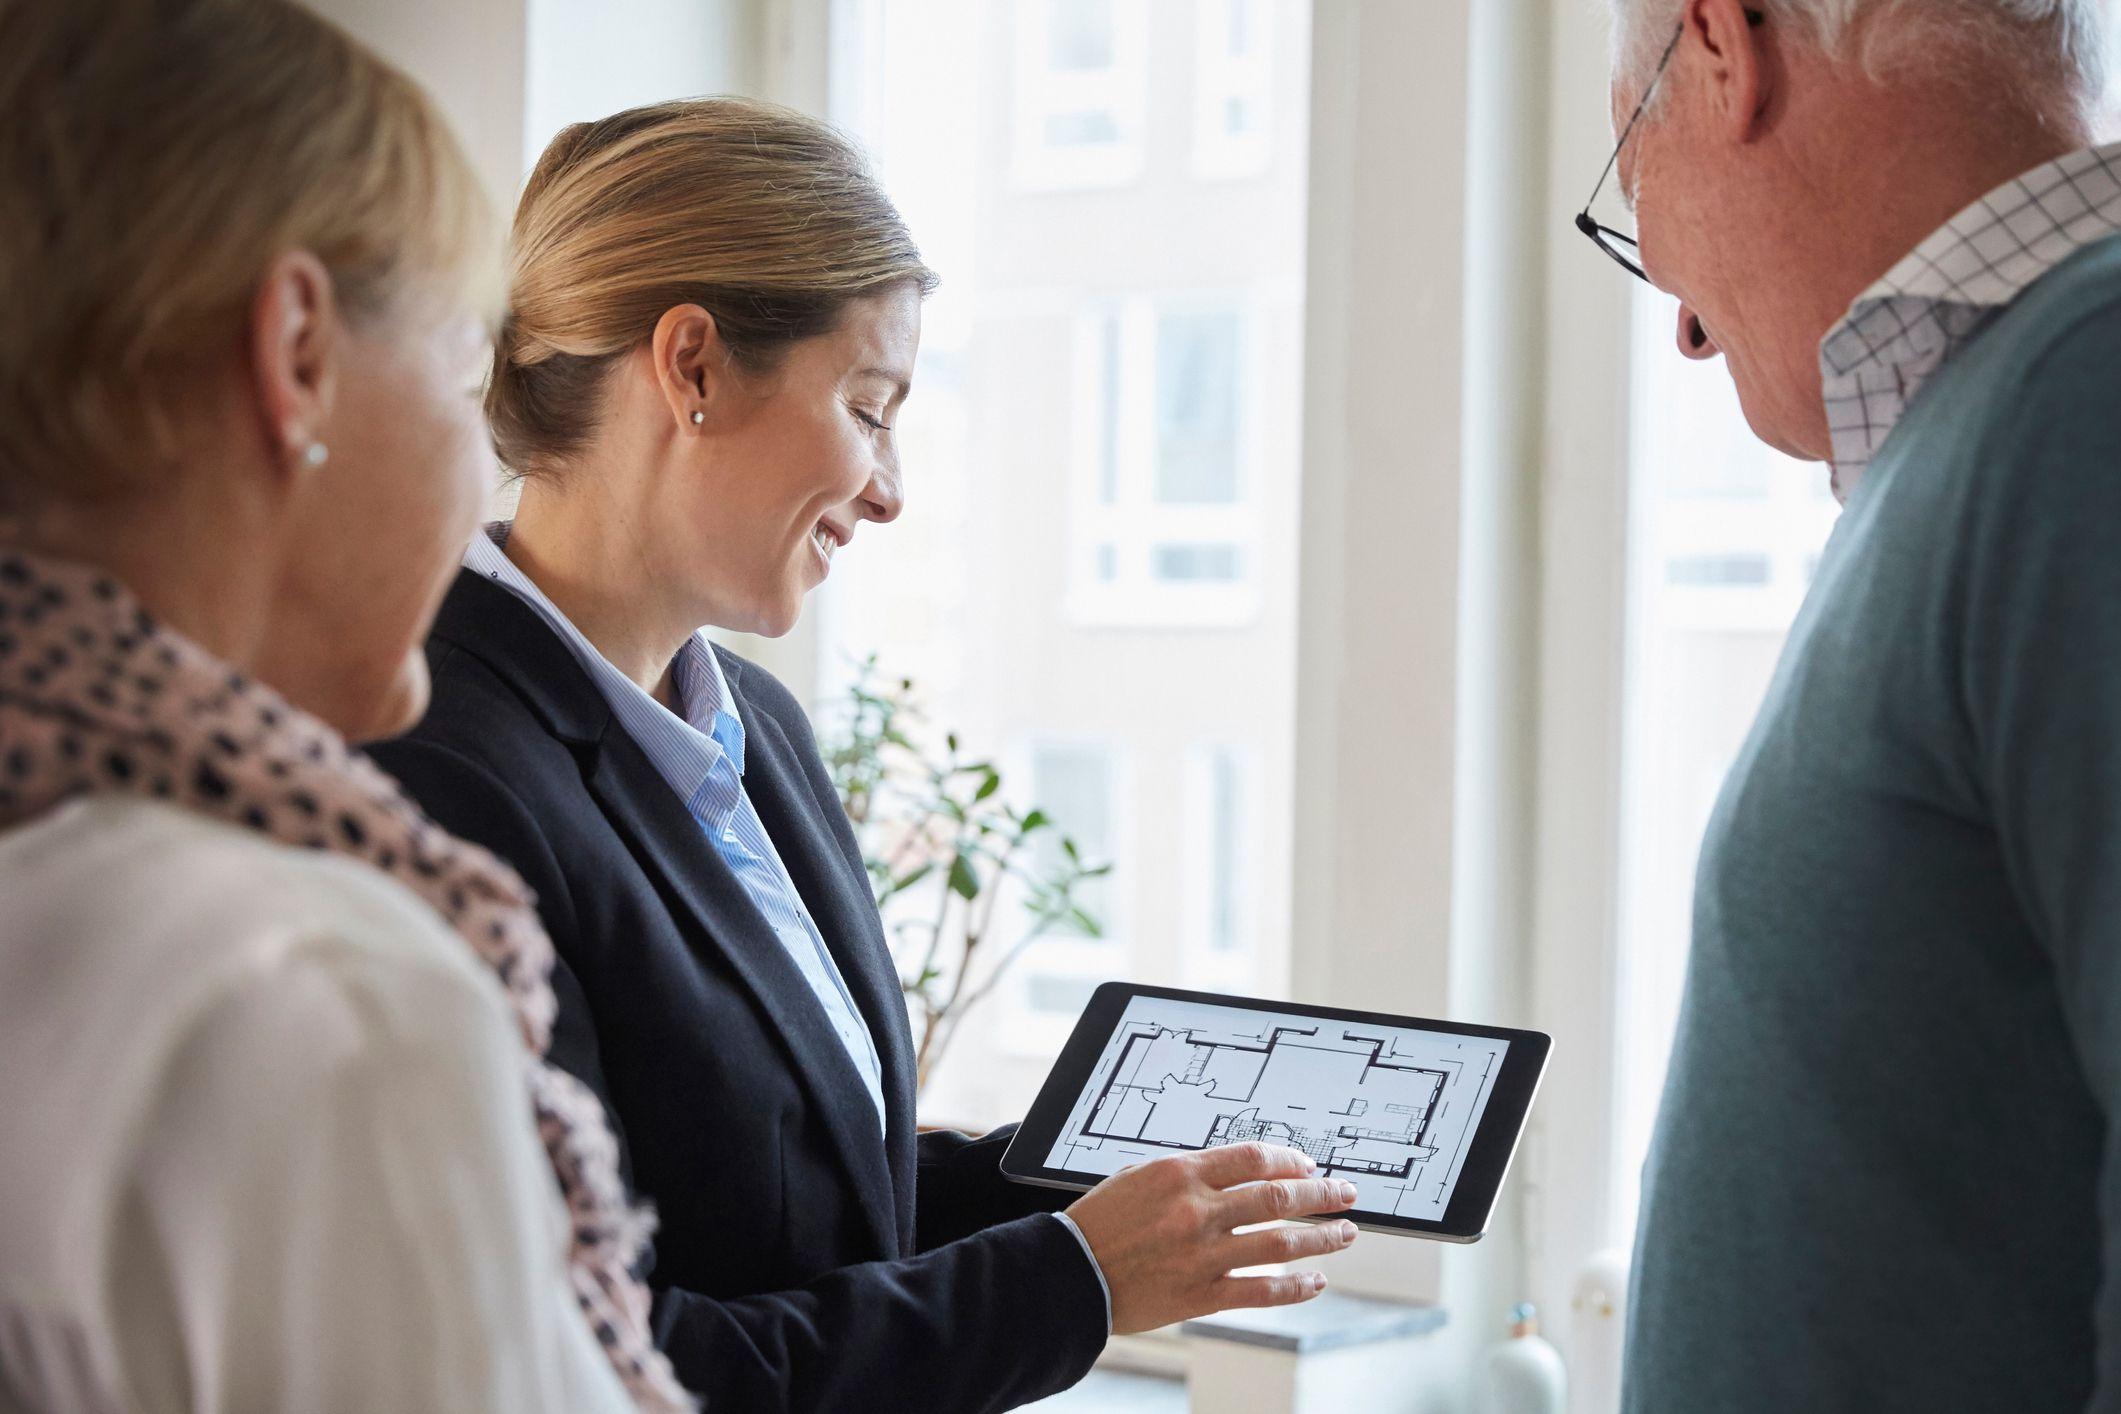 The 6 Best Online Real Estate Schools of 2020